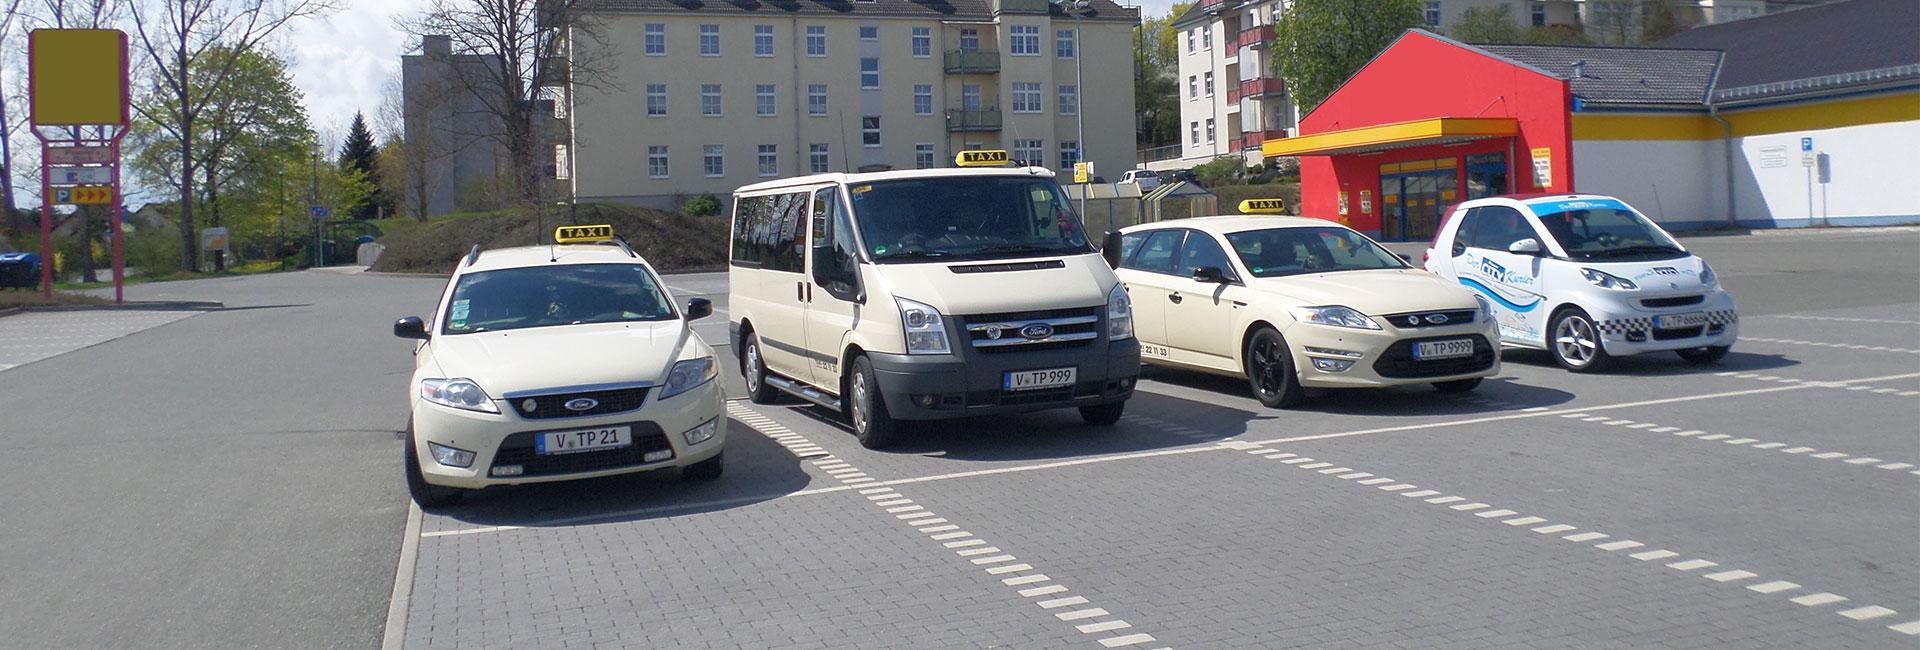 Taxiunternehmen Paul Groß